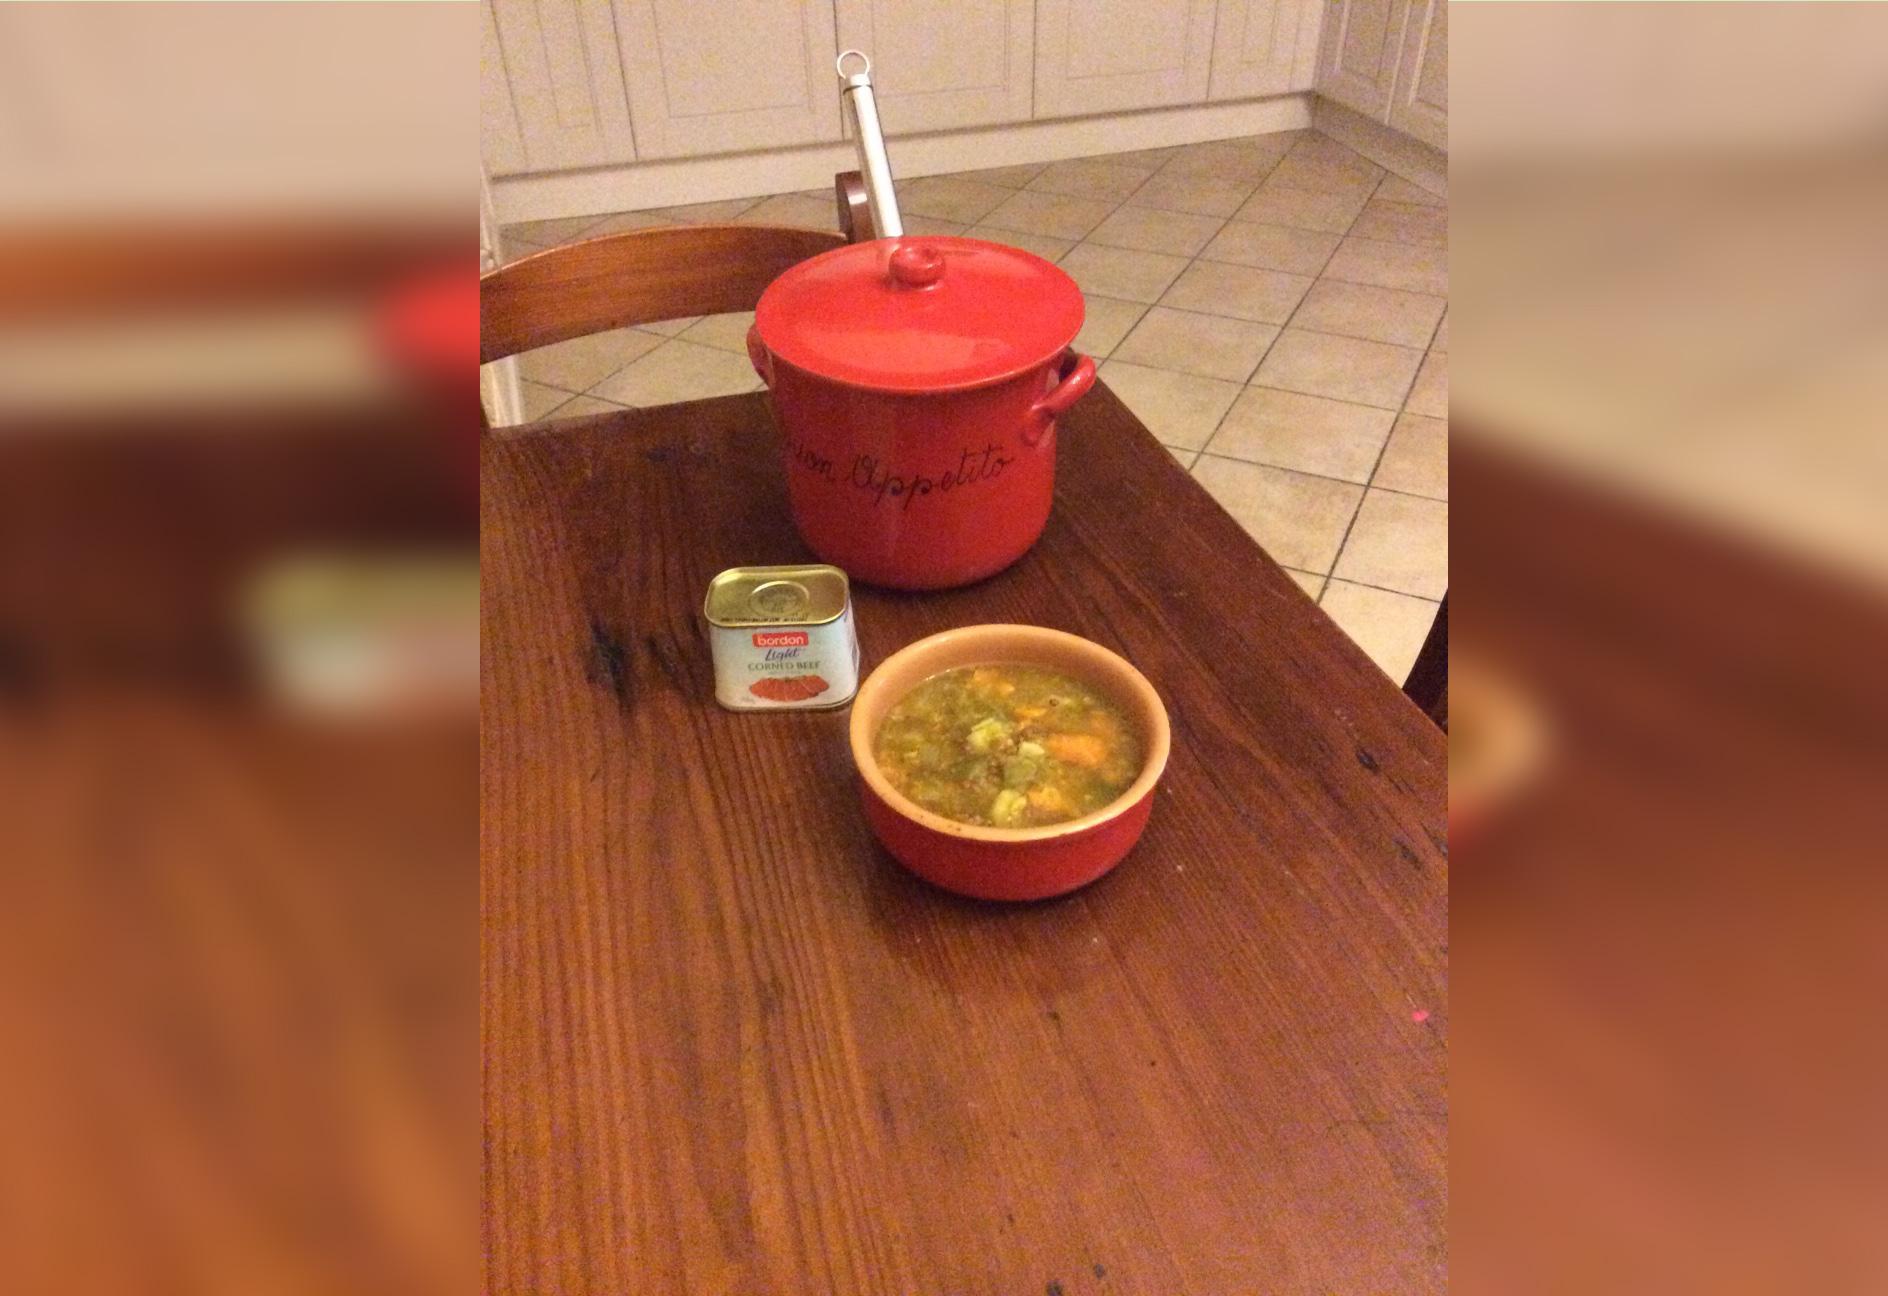 Doris-Camilleri-BORDON Recipe: Barley, corned beef and vegetable soup